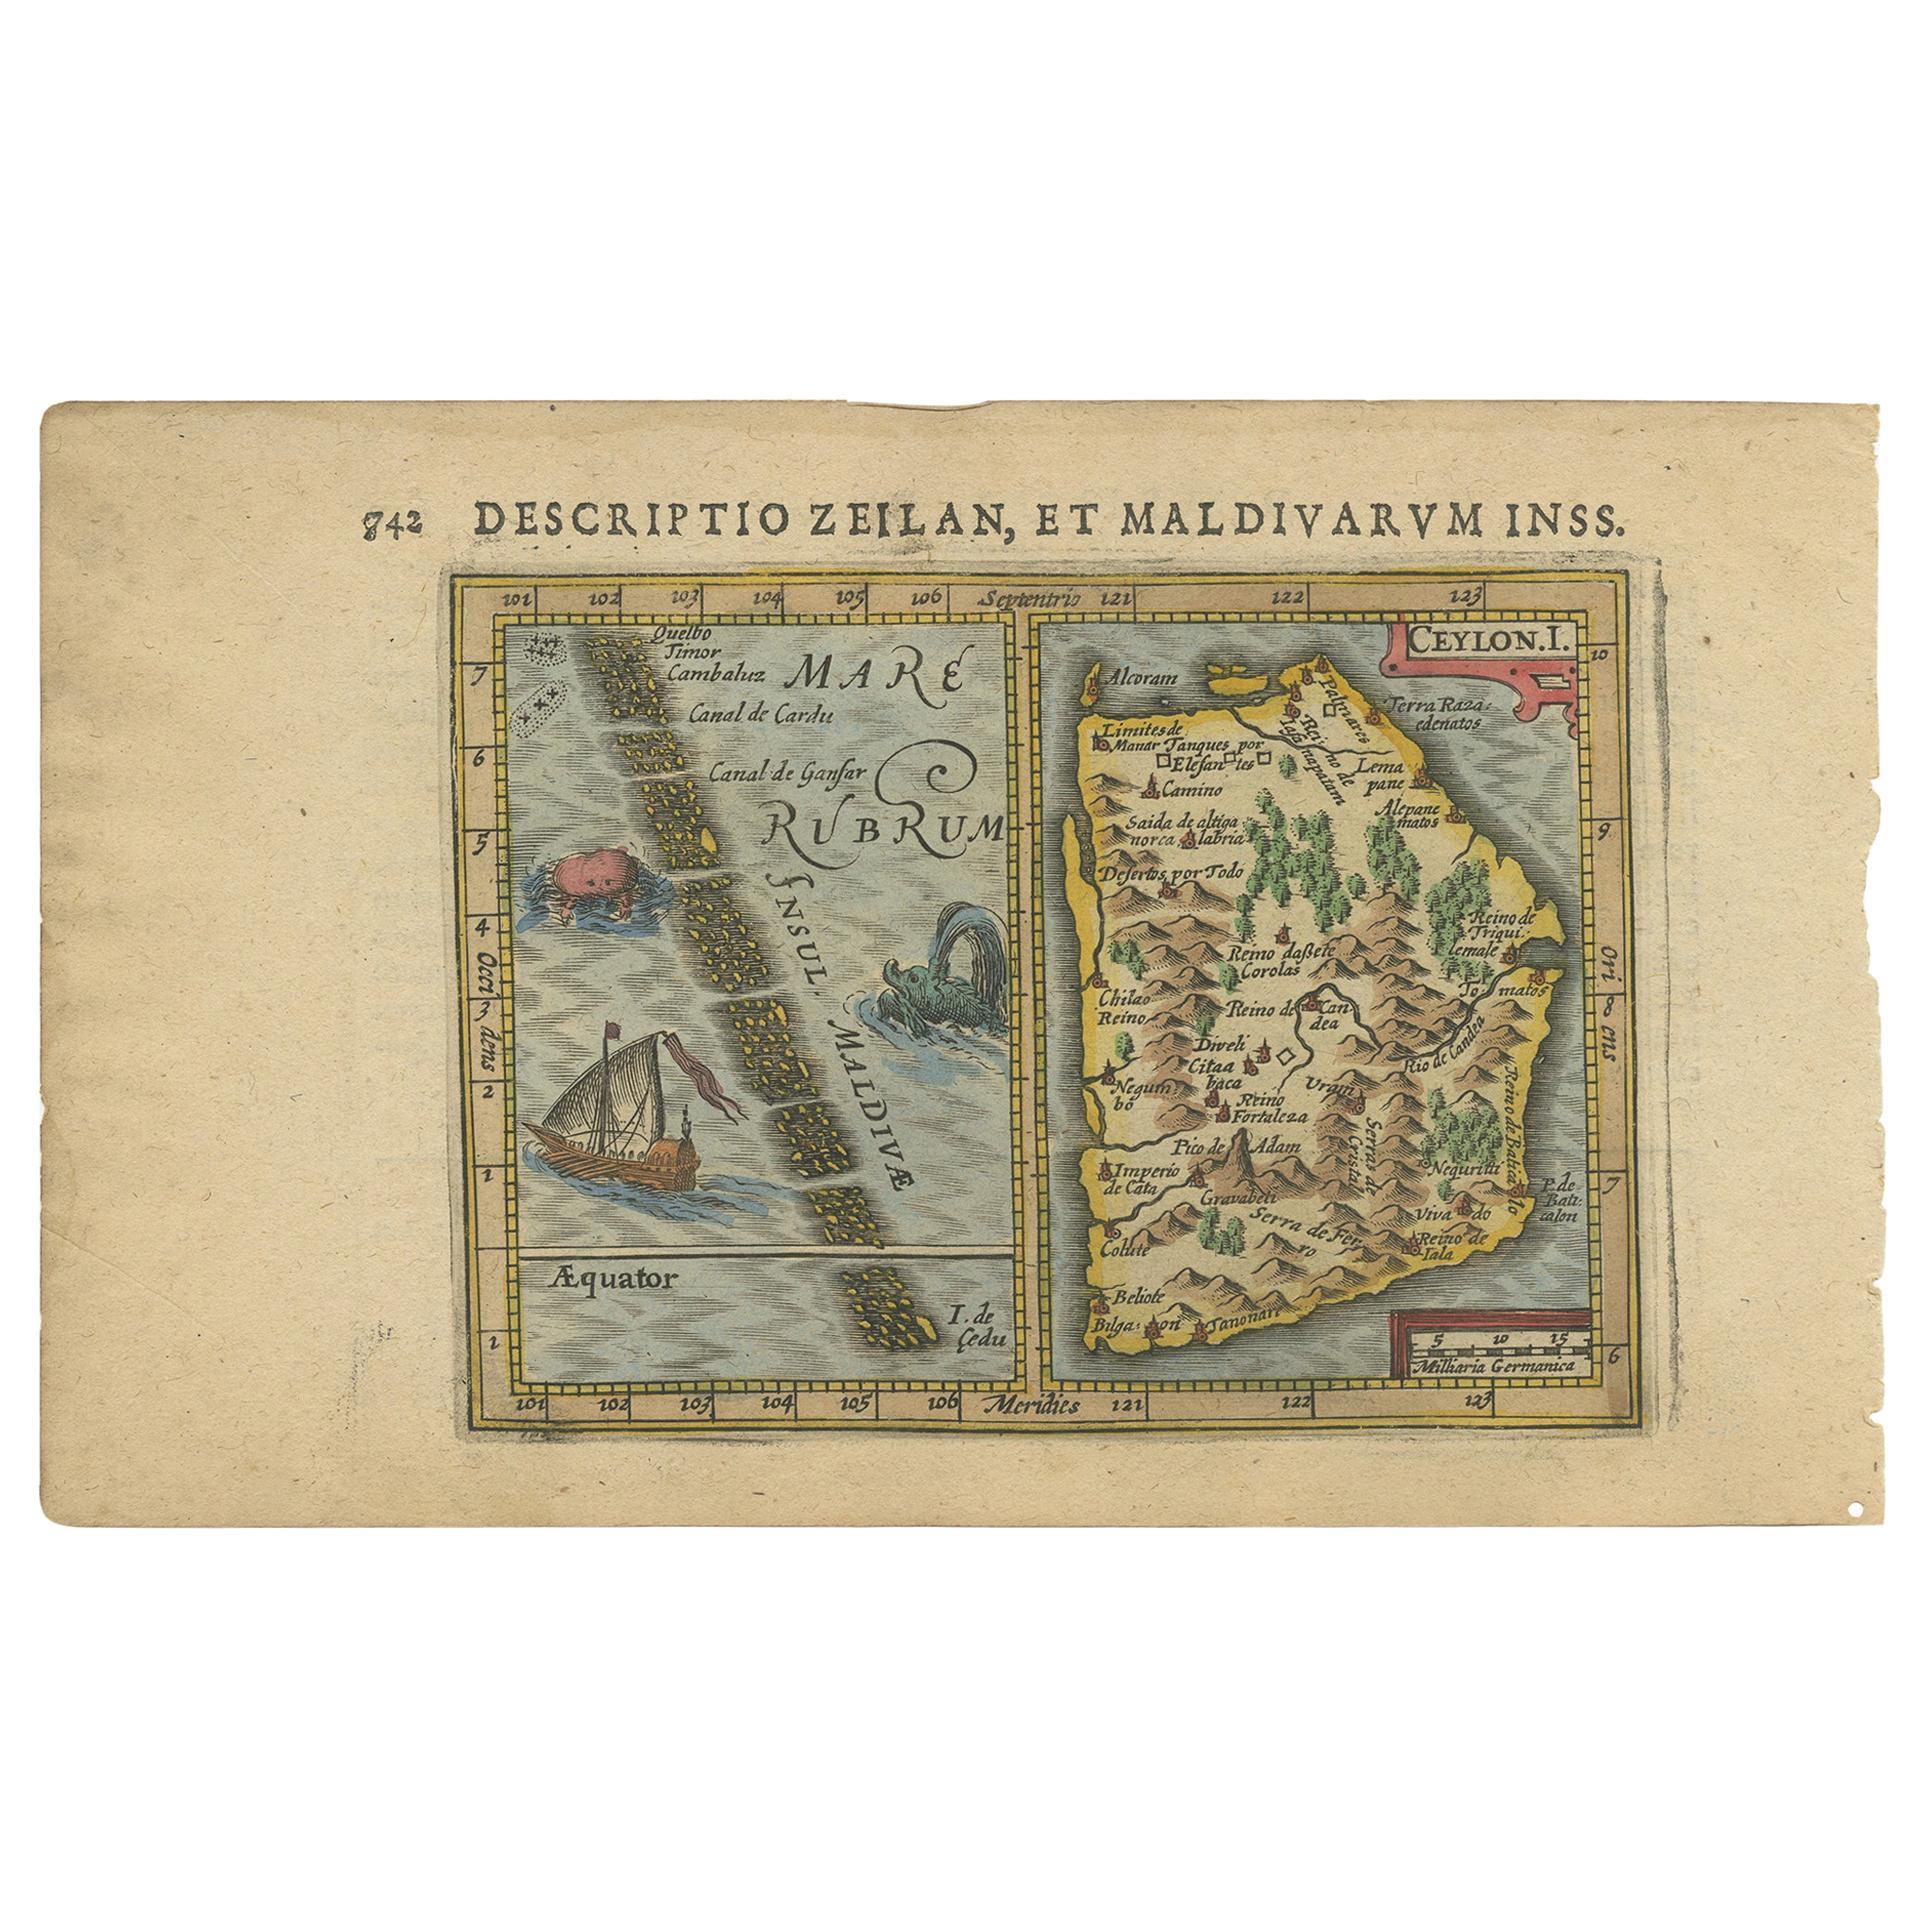 Antique Miniature Map of Ceylon 'Sri Lanka' and the Maldives by Bertius, 1618